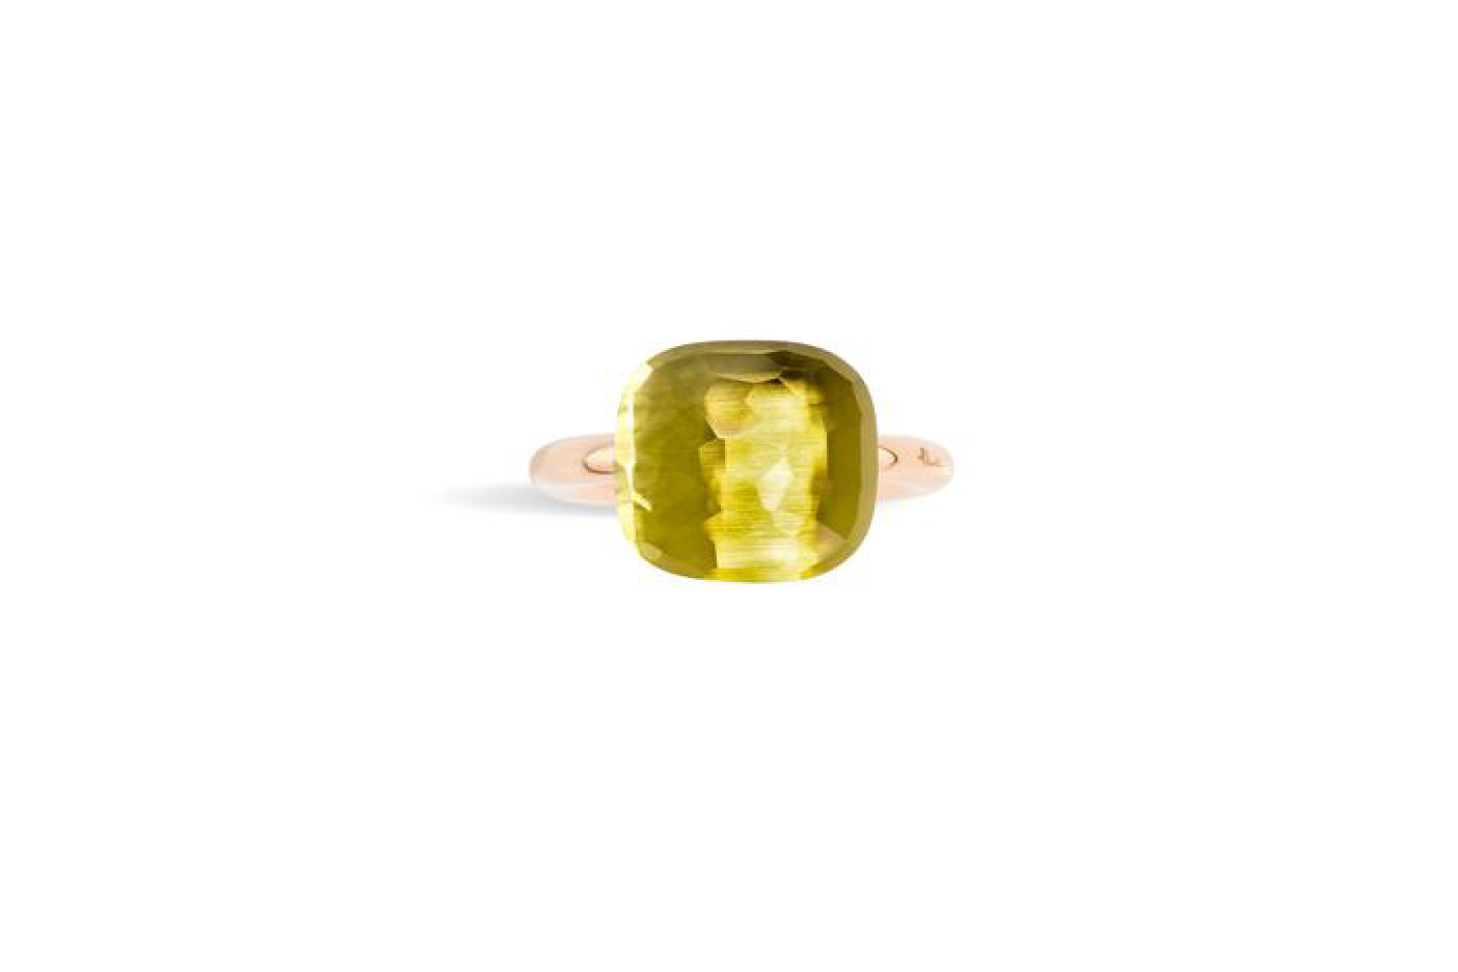 Pomellato Nudo Assoluto Ring with Lemon Quartz